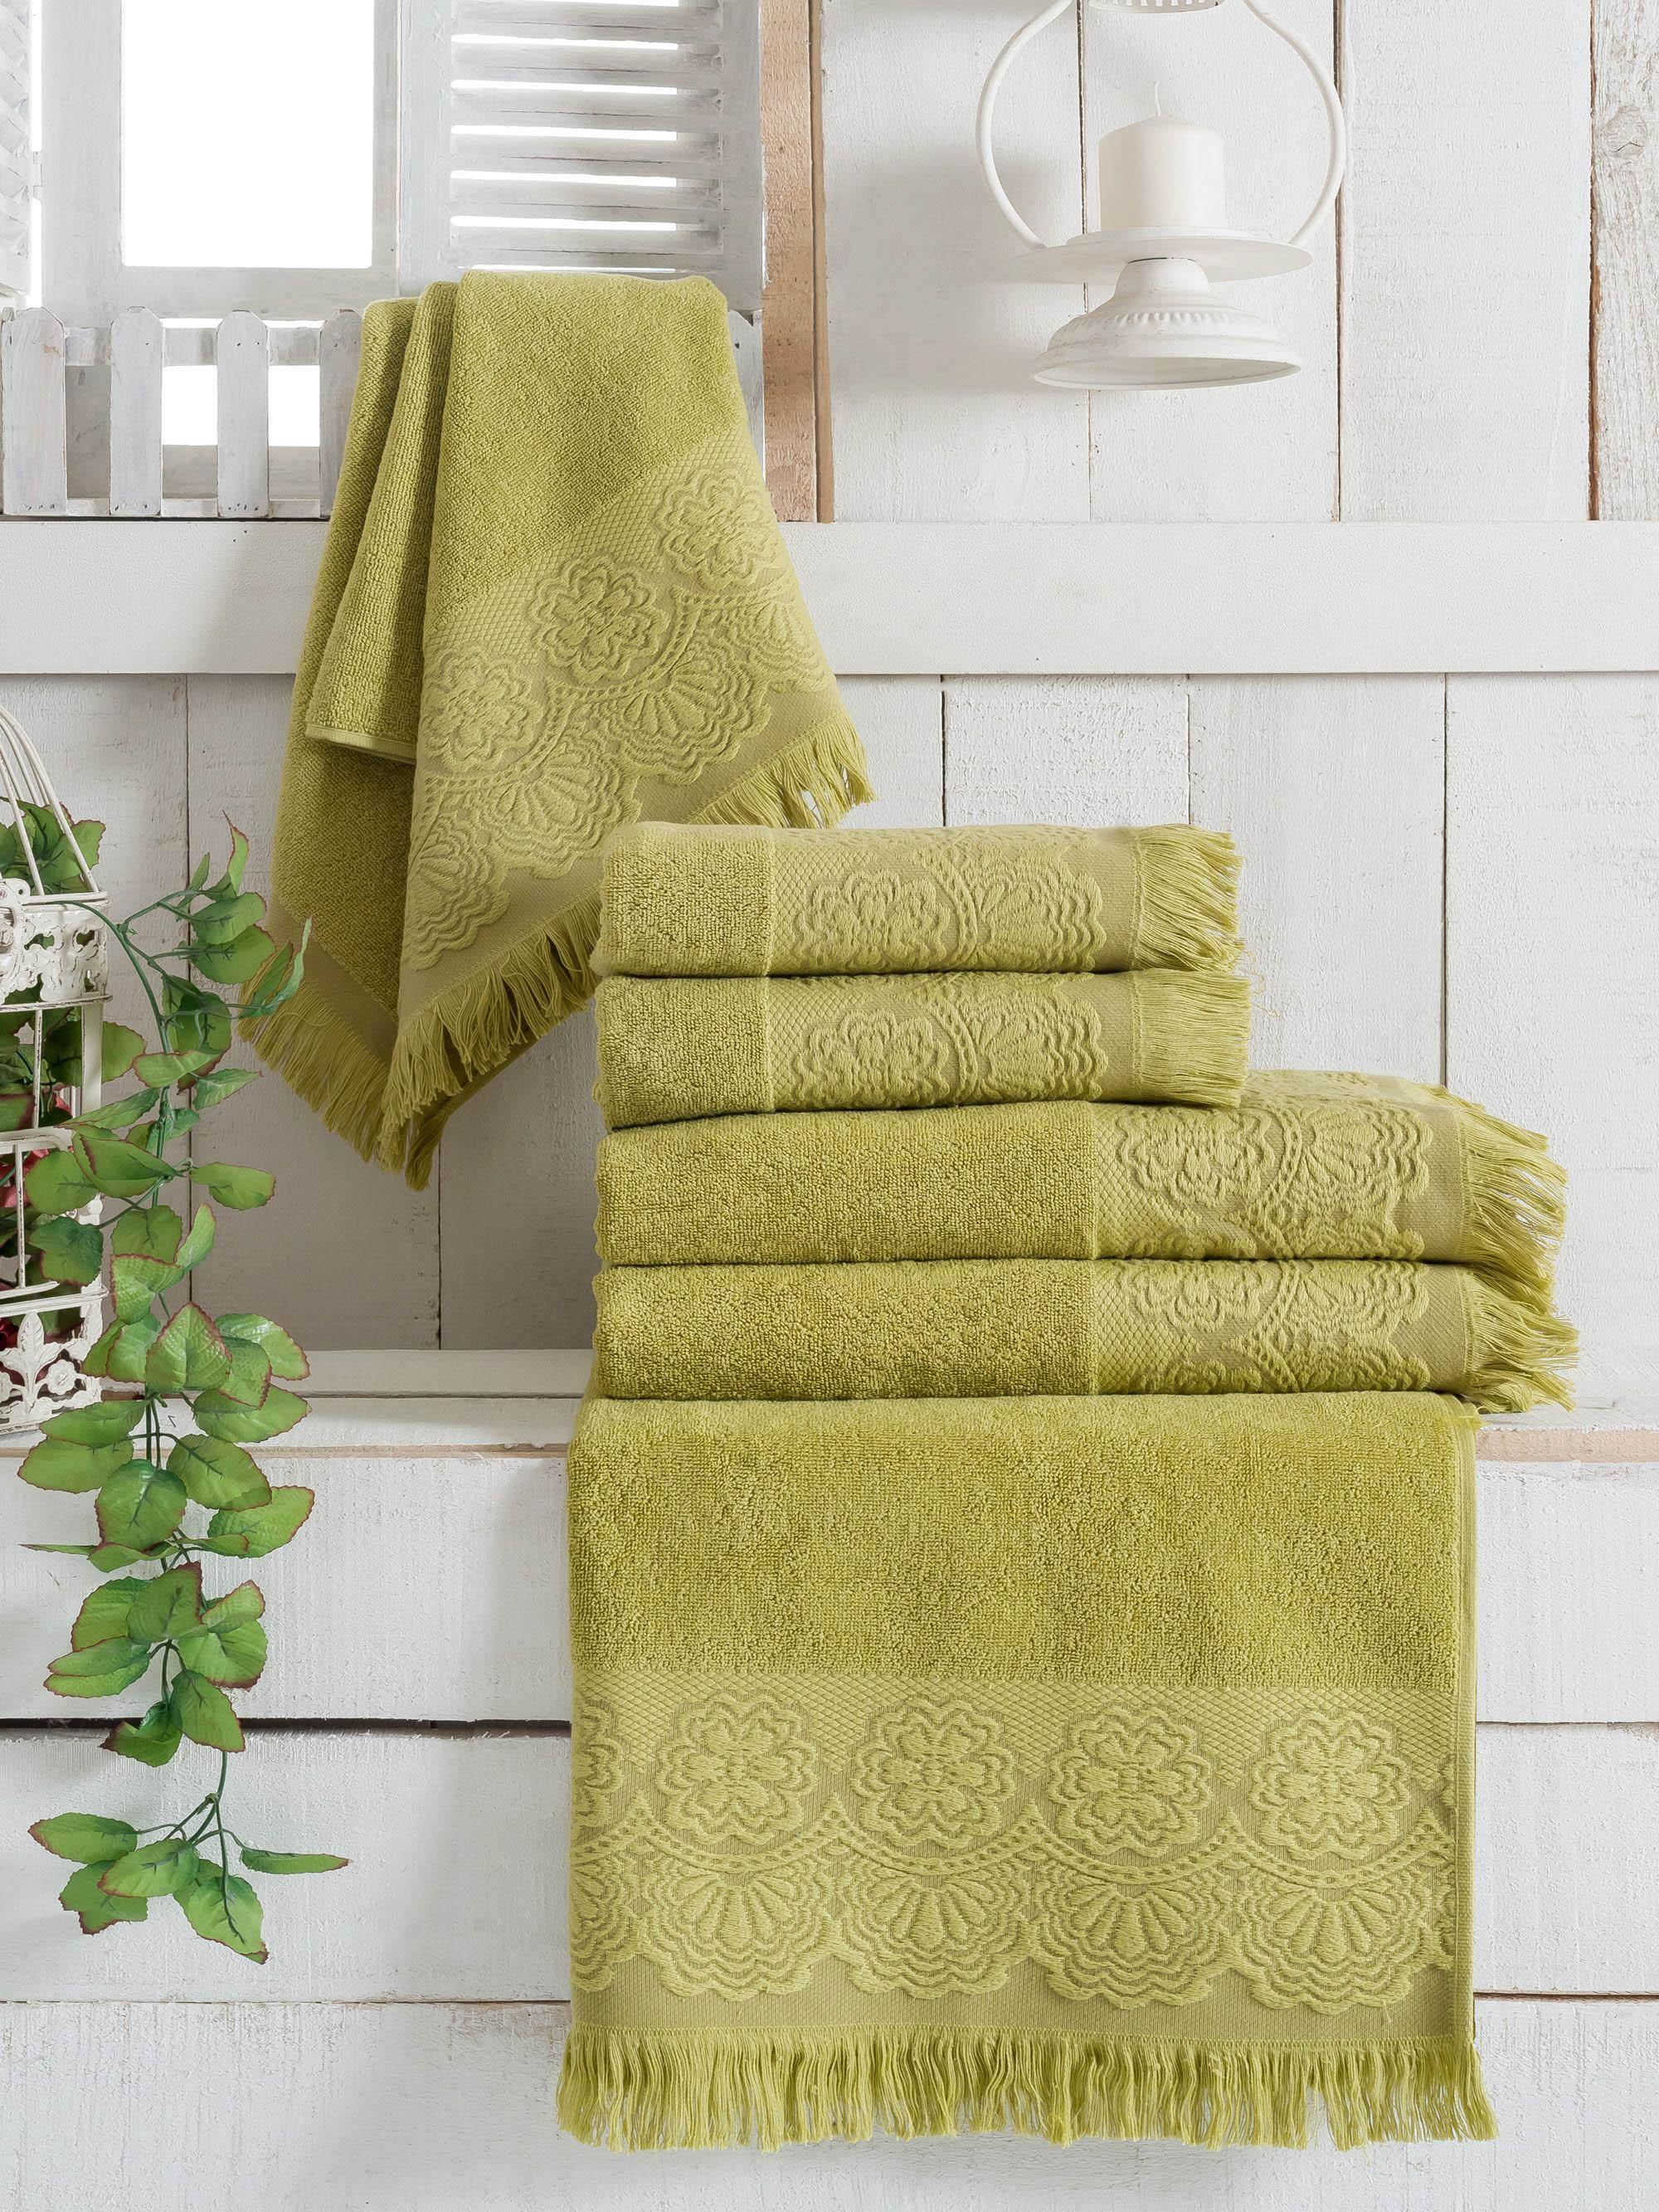 Полотенца Sokuculer Полотенце Zara Цвет: Зеленый (50х90 см - 3 шт) полотенца банные spasilk полотенце 3 шт